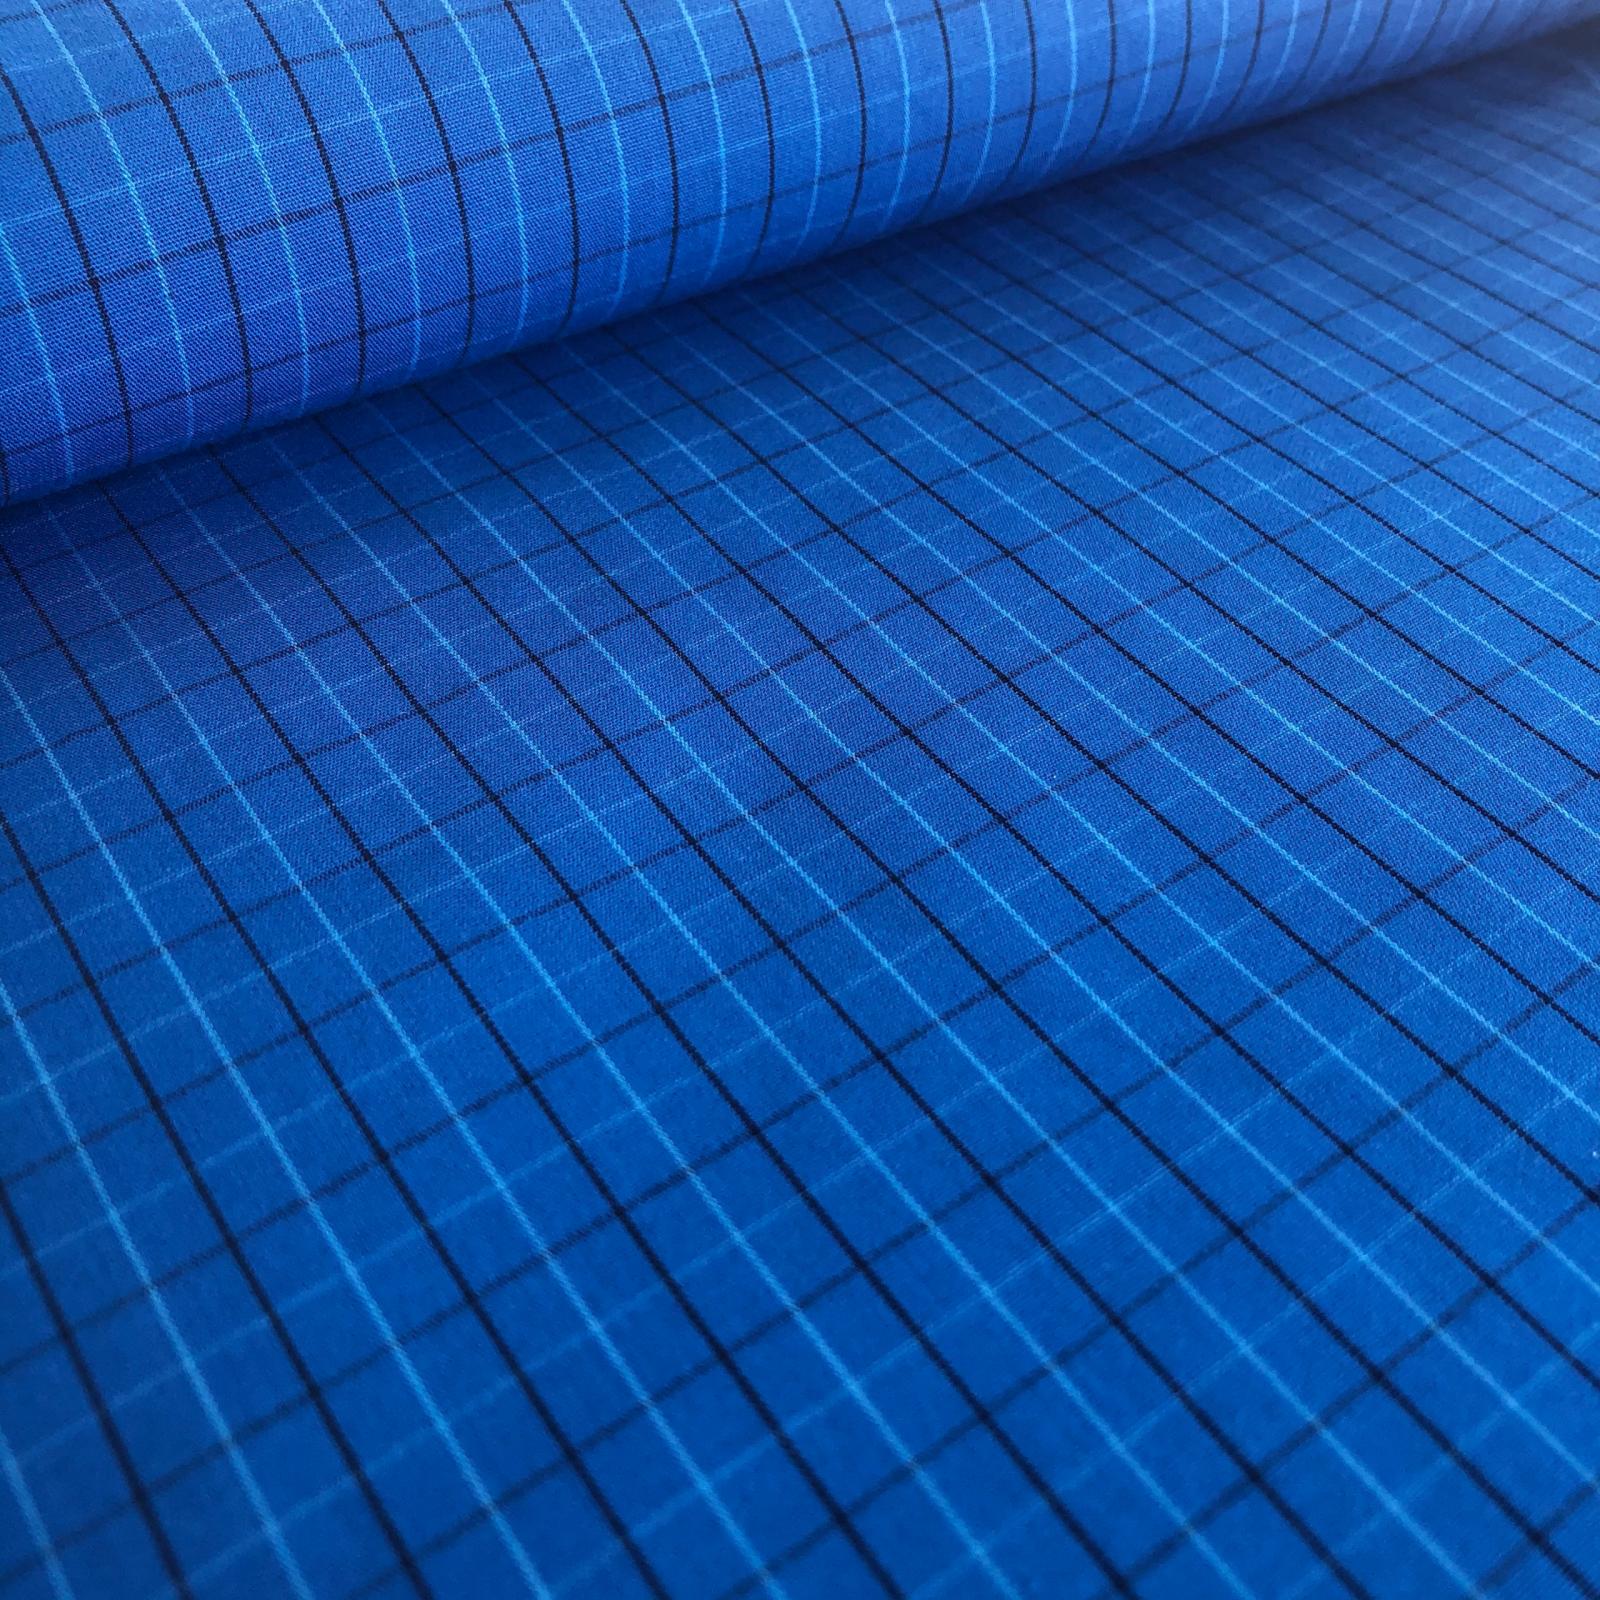 Harriot Yarn Dyed Cotton - Blue Plaid